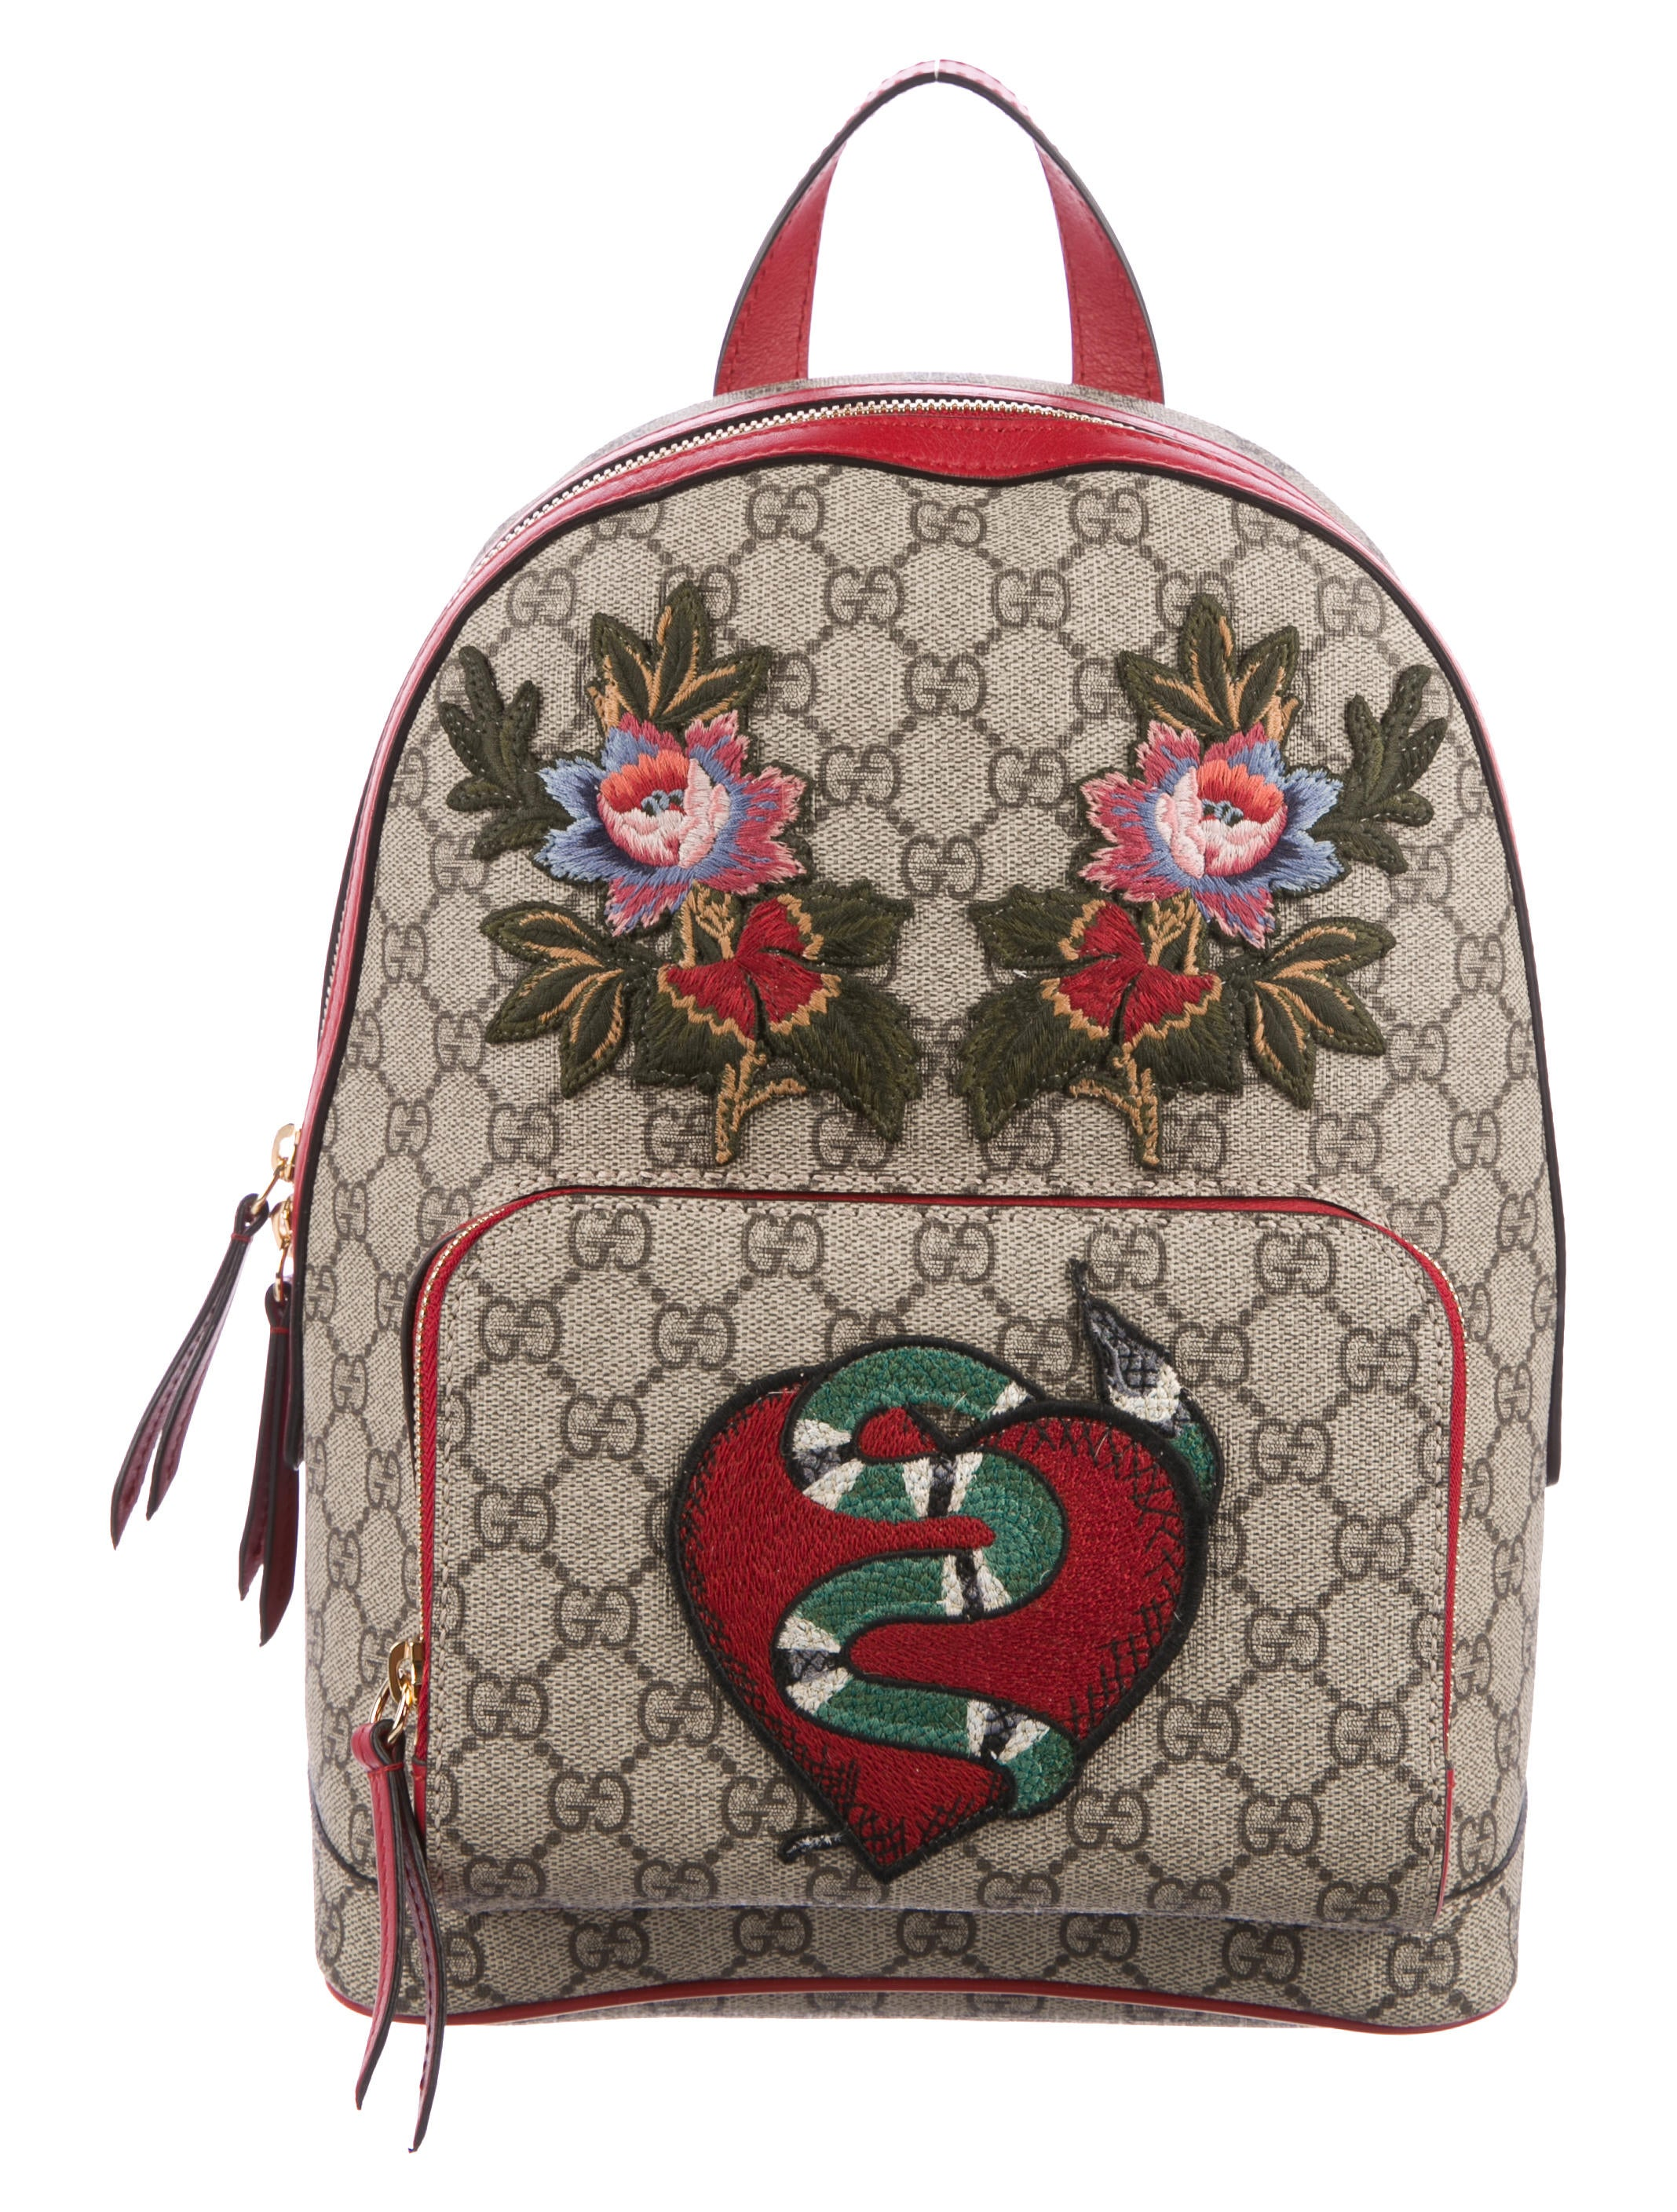 e2dfbecc625 Gucci GG Supreme Embroidered Backpack - Handbags - GUC171080